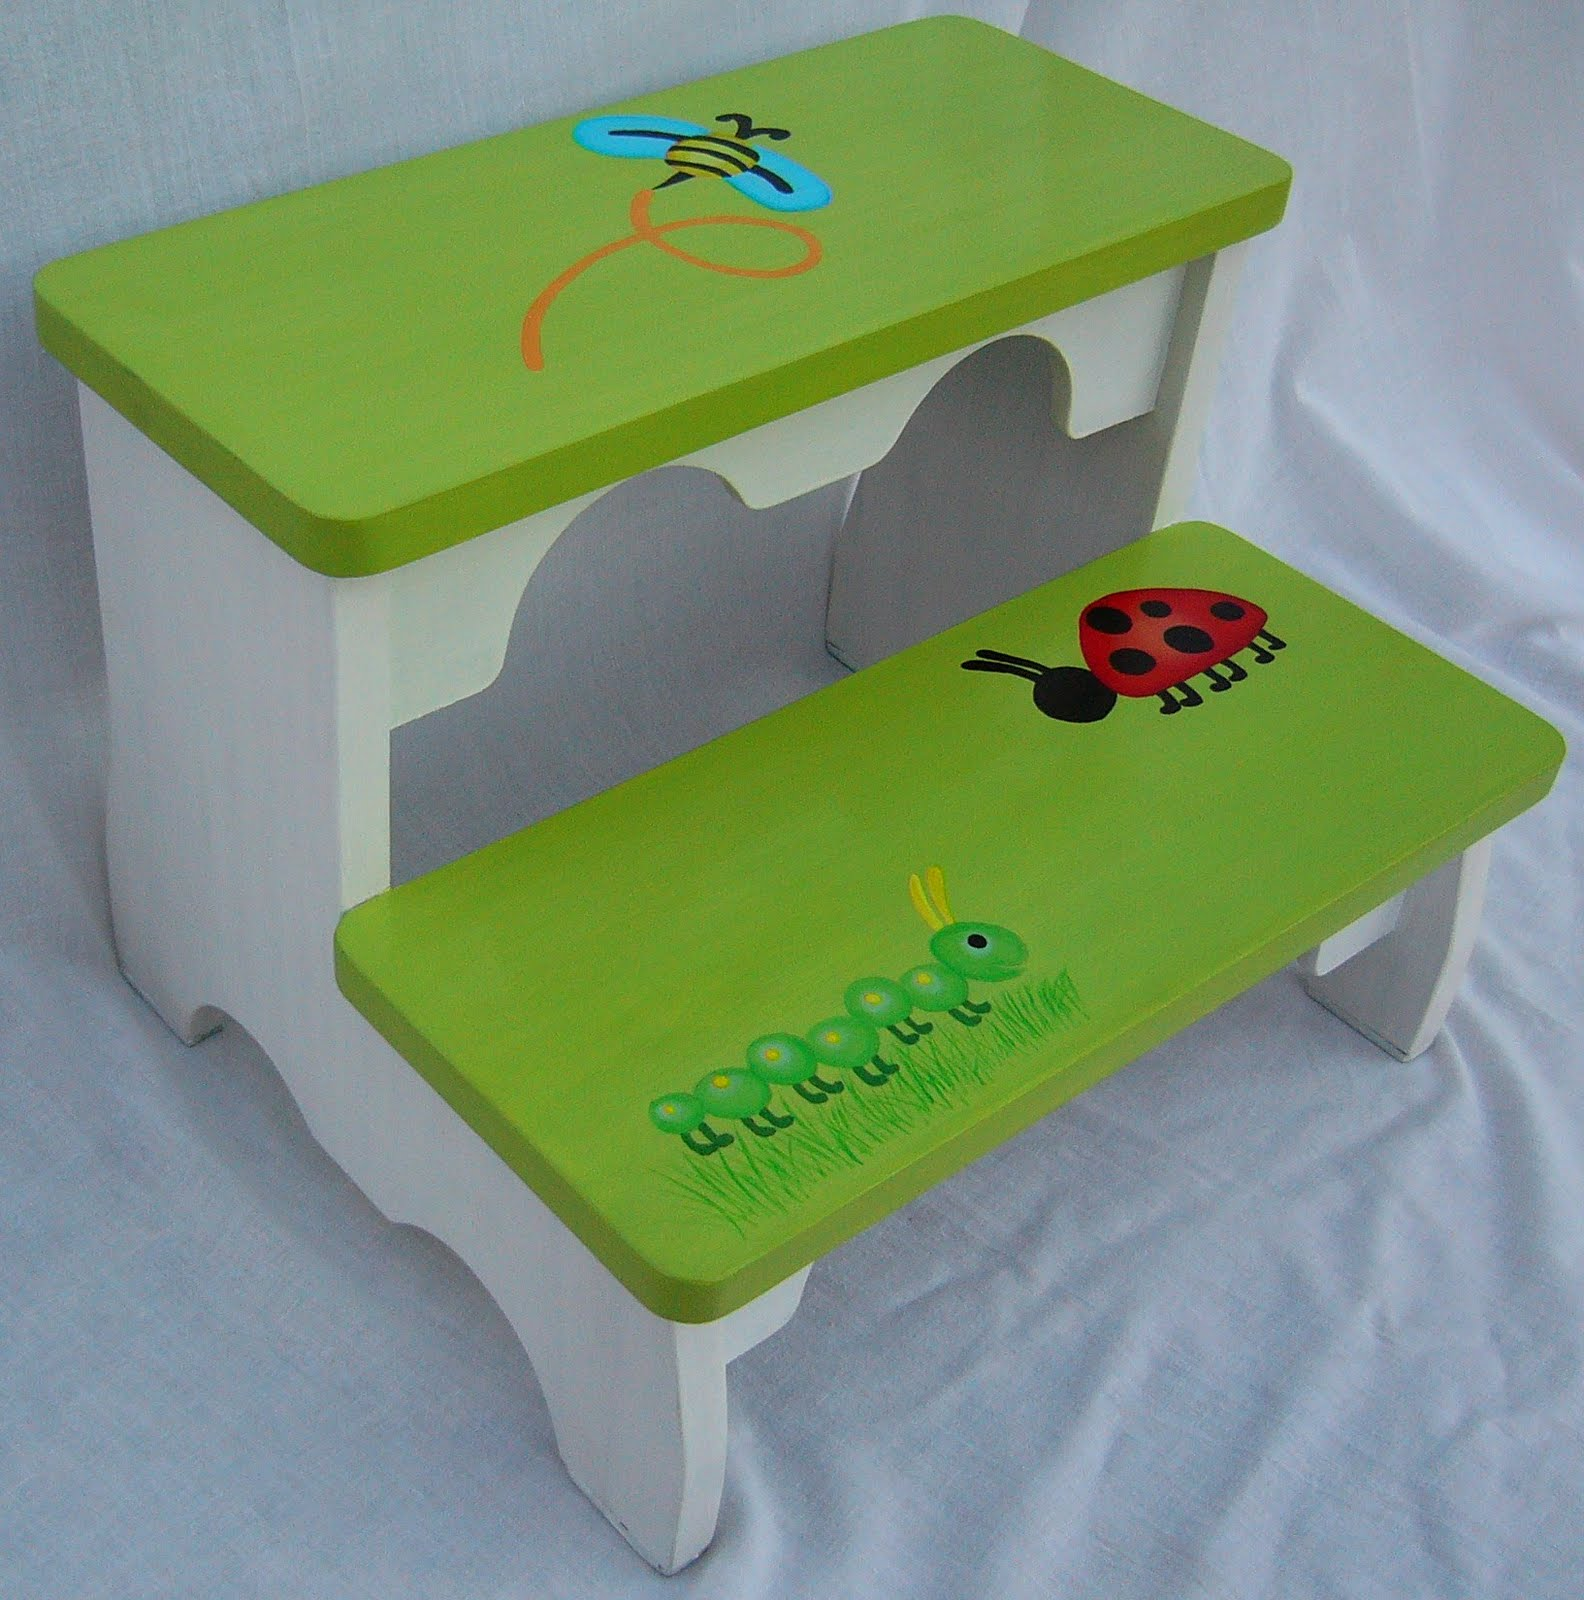 Muebles infantiles decoraci n para ni os juguetes tejidos manualidades cocina etc banquito - Muebles para juguetes infantiles ...